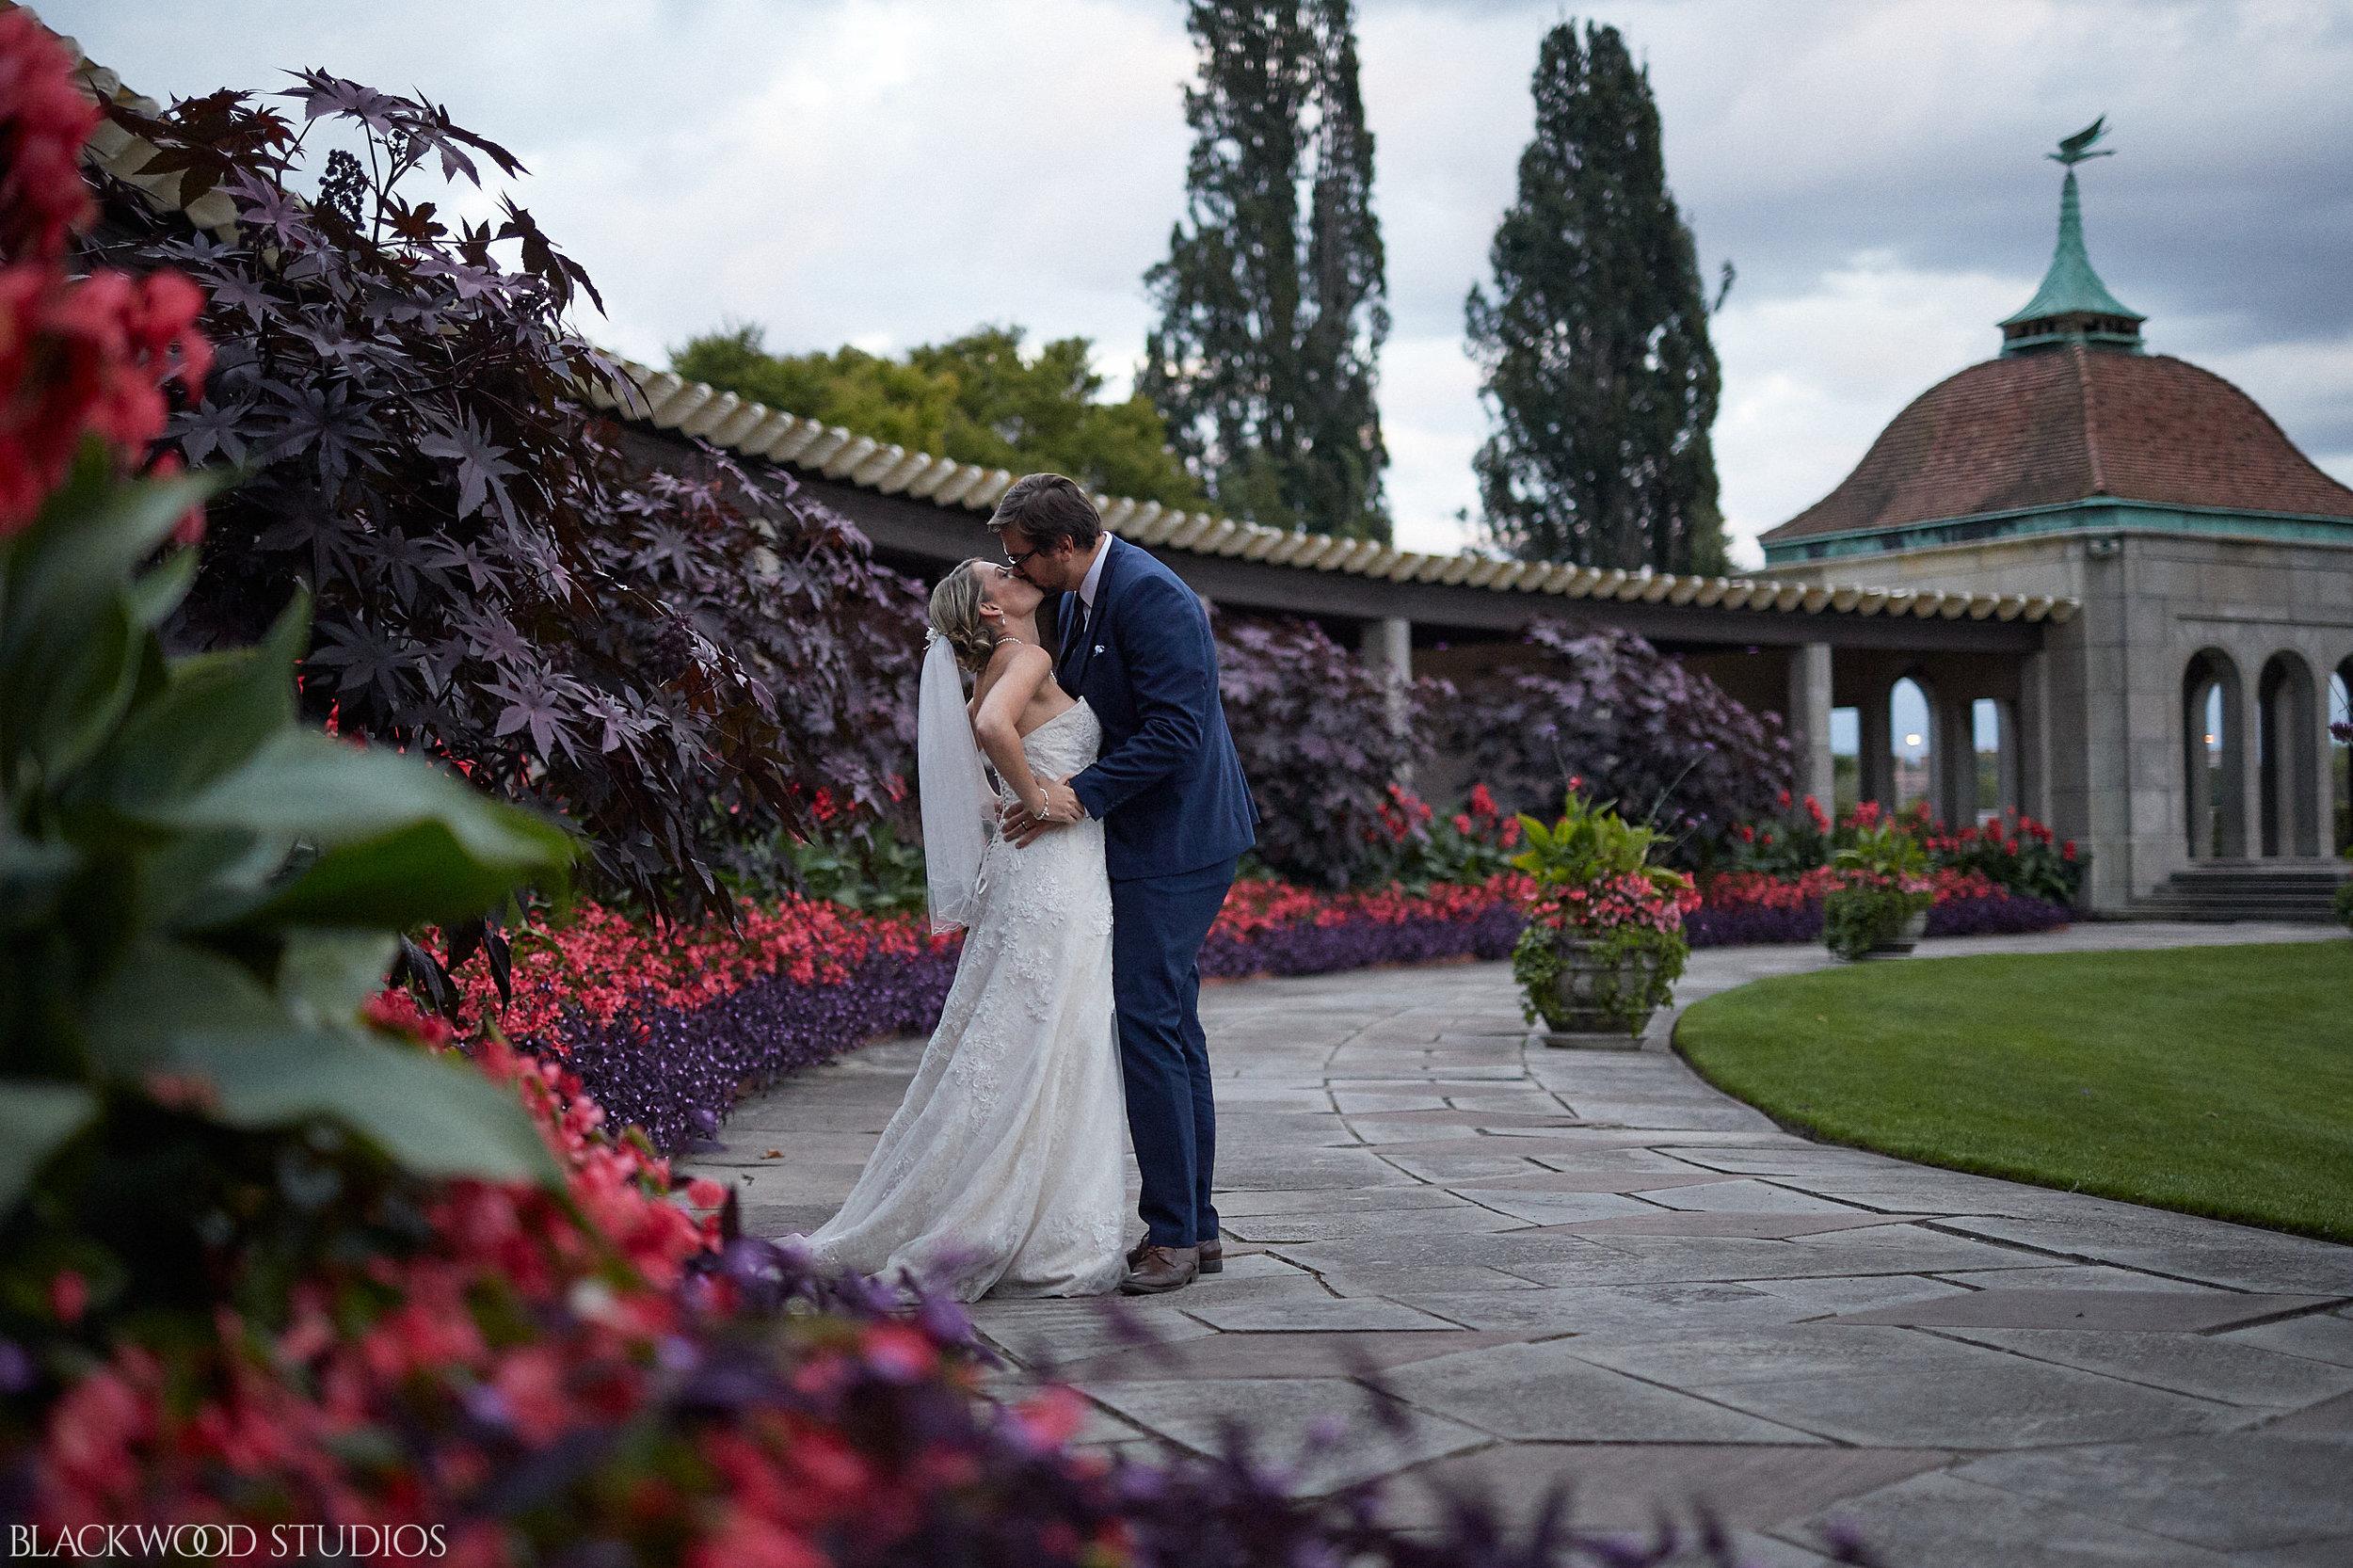 Blackwood-Studios-Wedding-Photography-20170928-185234-Marek-Katie-Michalek-Oakes-Garden-Theatre-Niagara-Falls-Ontario-Canada.jpg